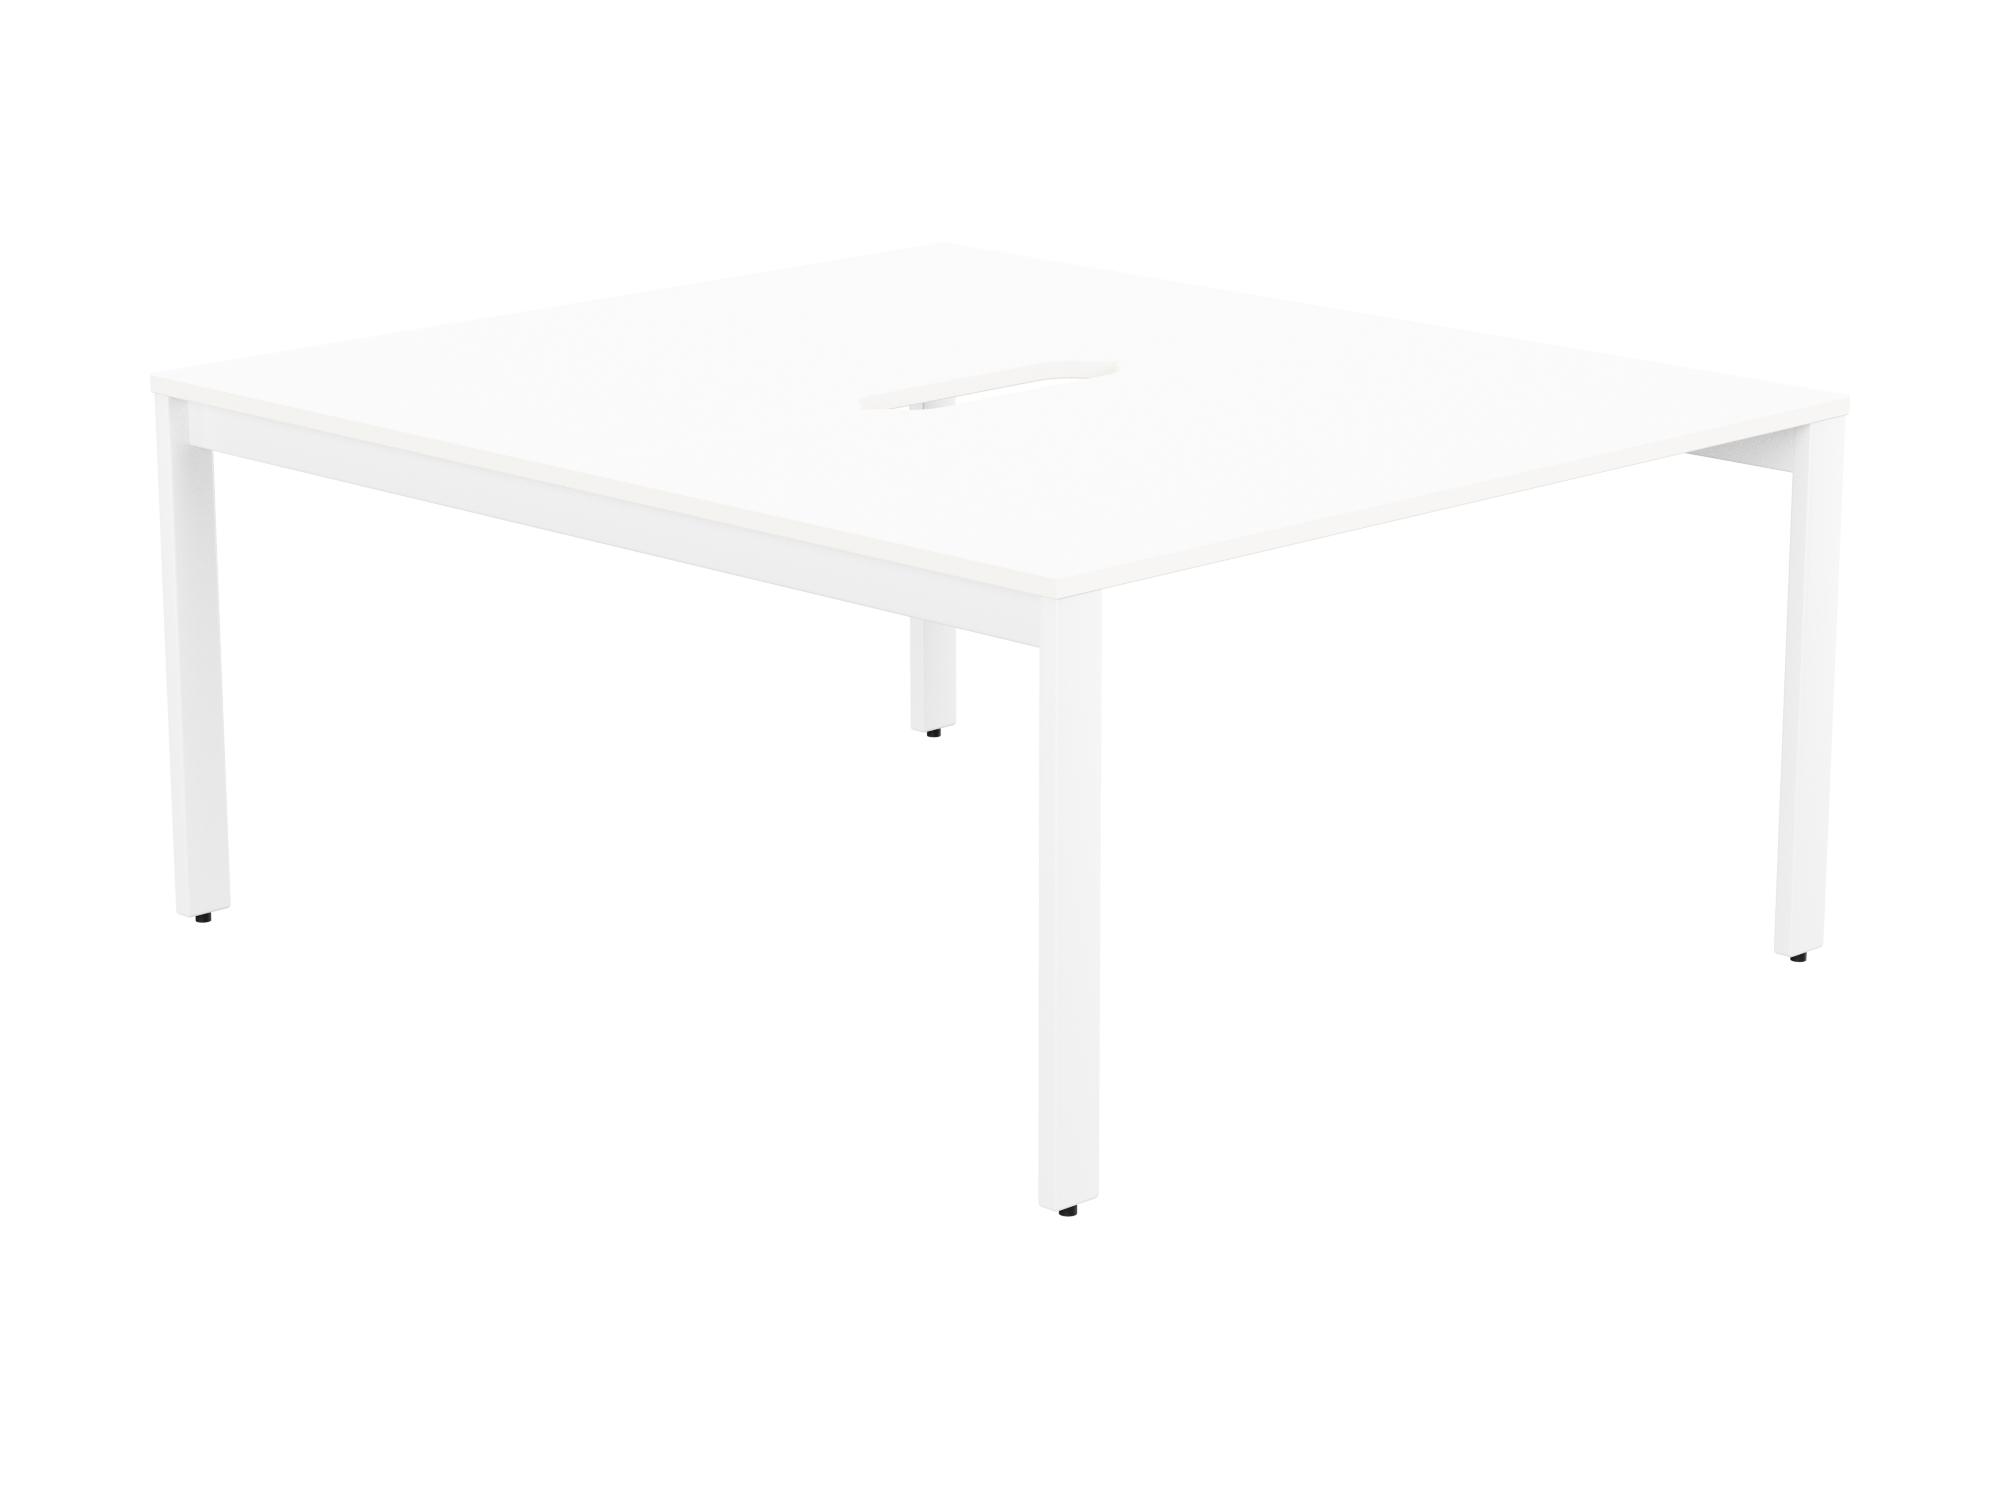 Switch 2 Person Bench Open Leg Scallop Top 1400 x 800 - White Frame / White Top